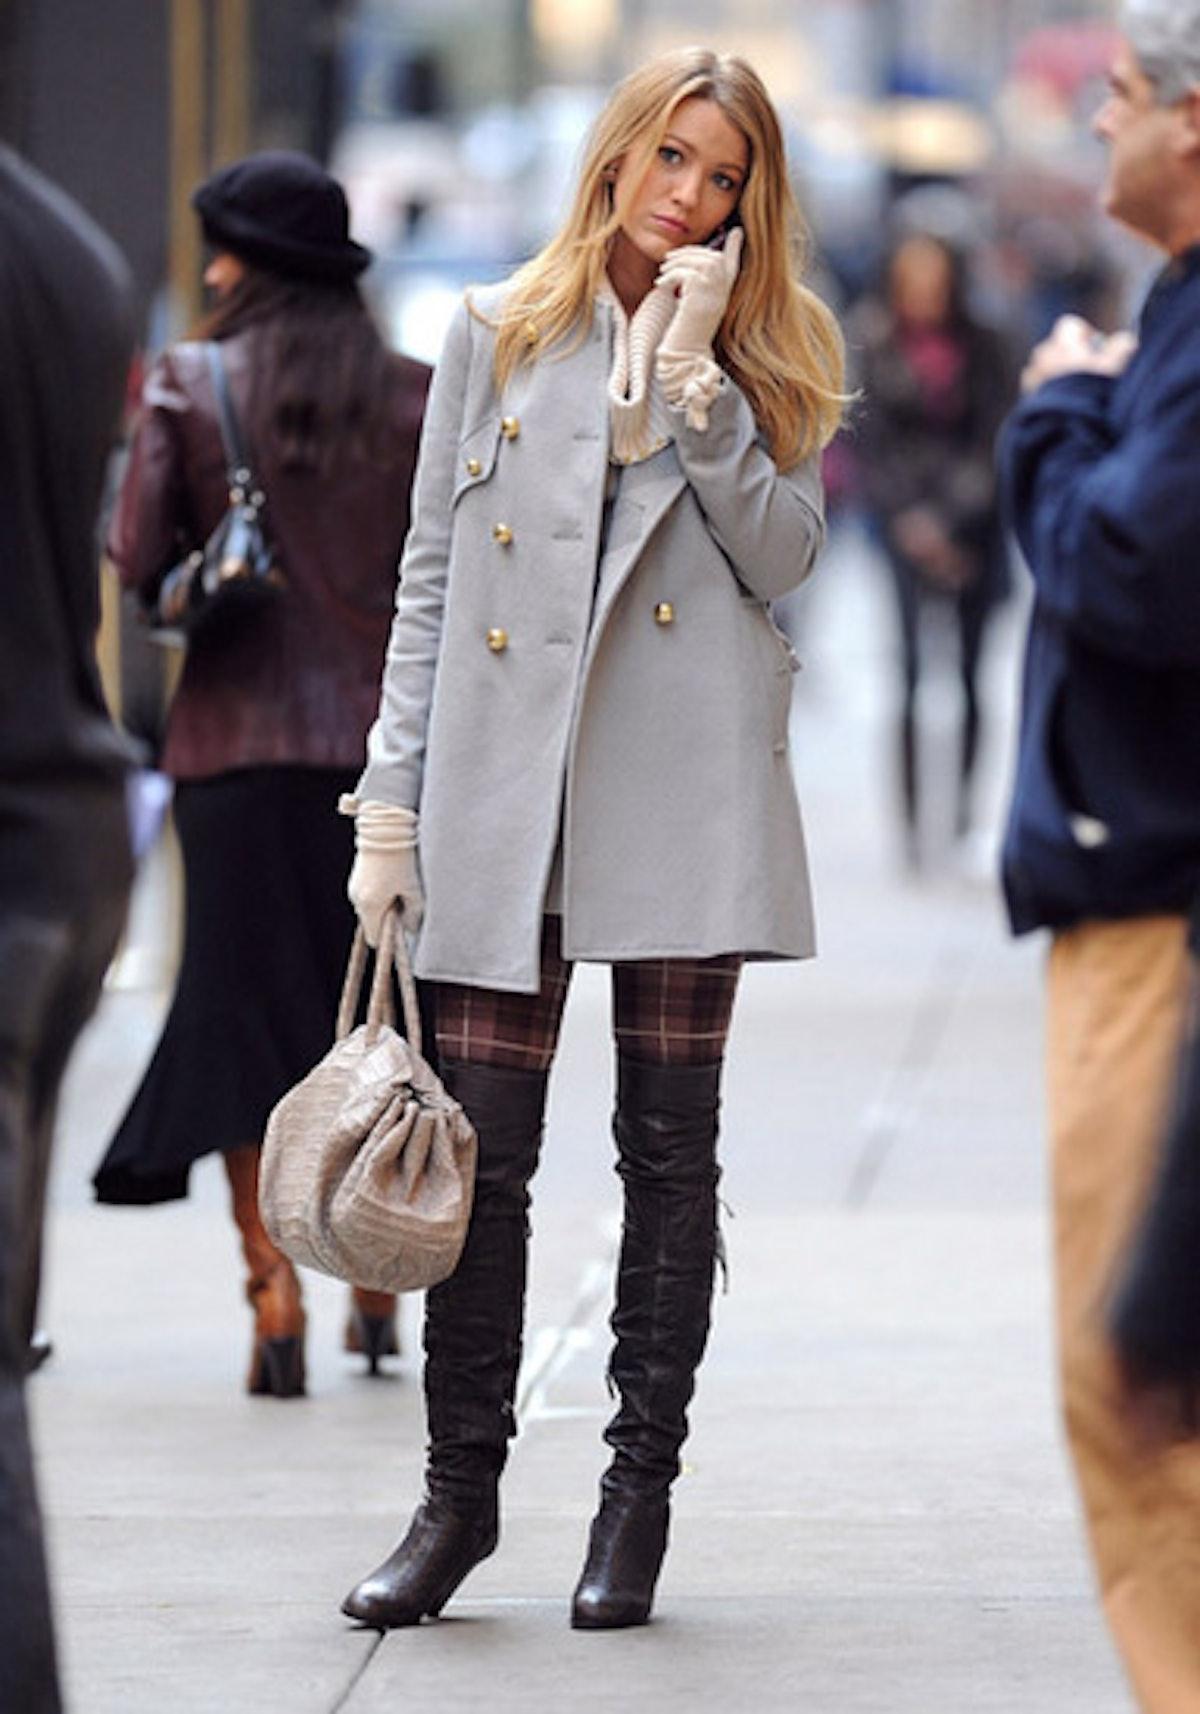 thigh-high-boots-gossip-girl_fa-thumb-386x550.jpg